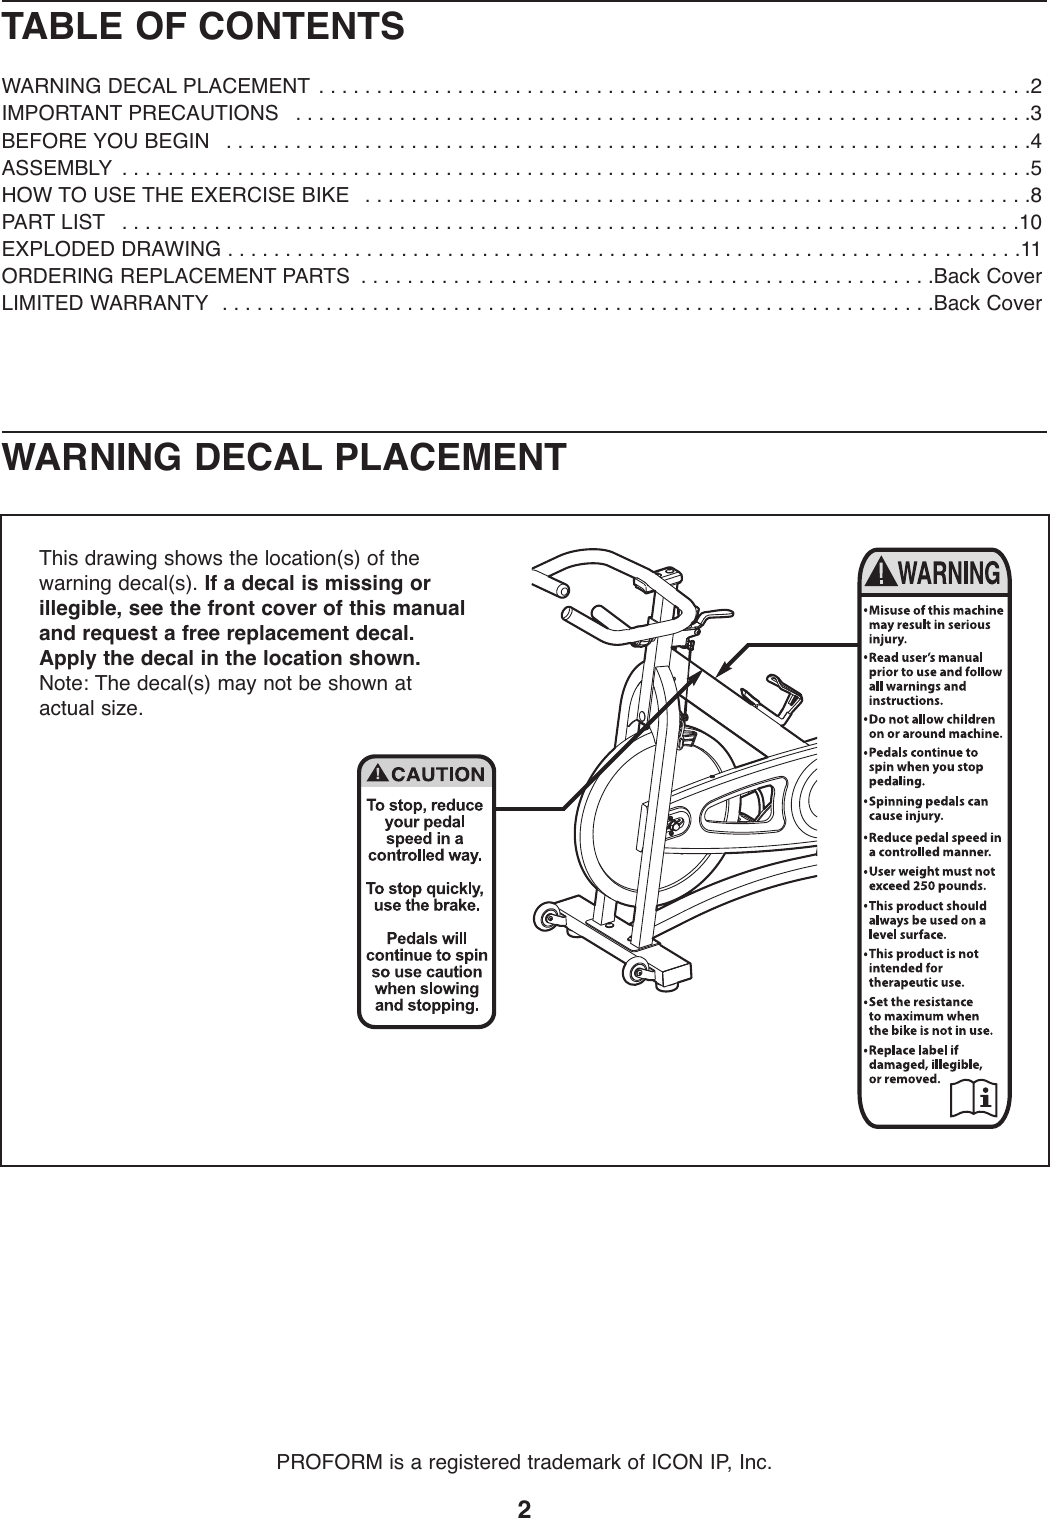 Proform Pfex029092 290 Spx Bike Users Manual 285430